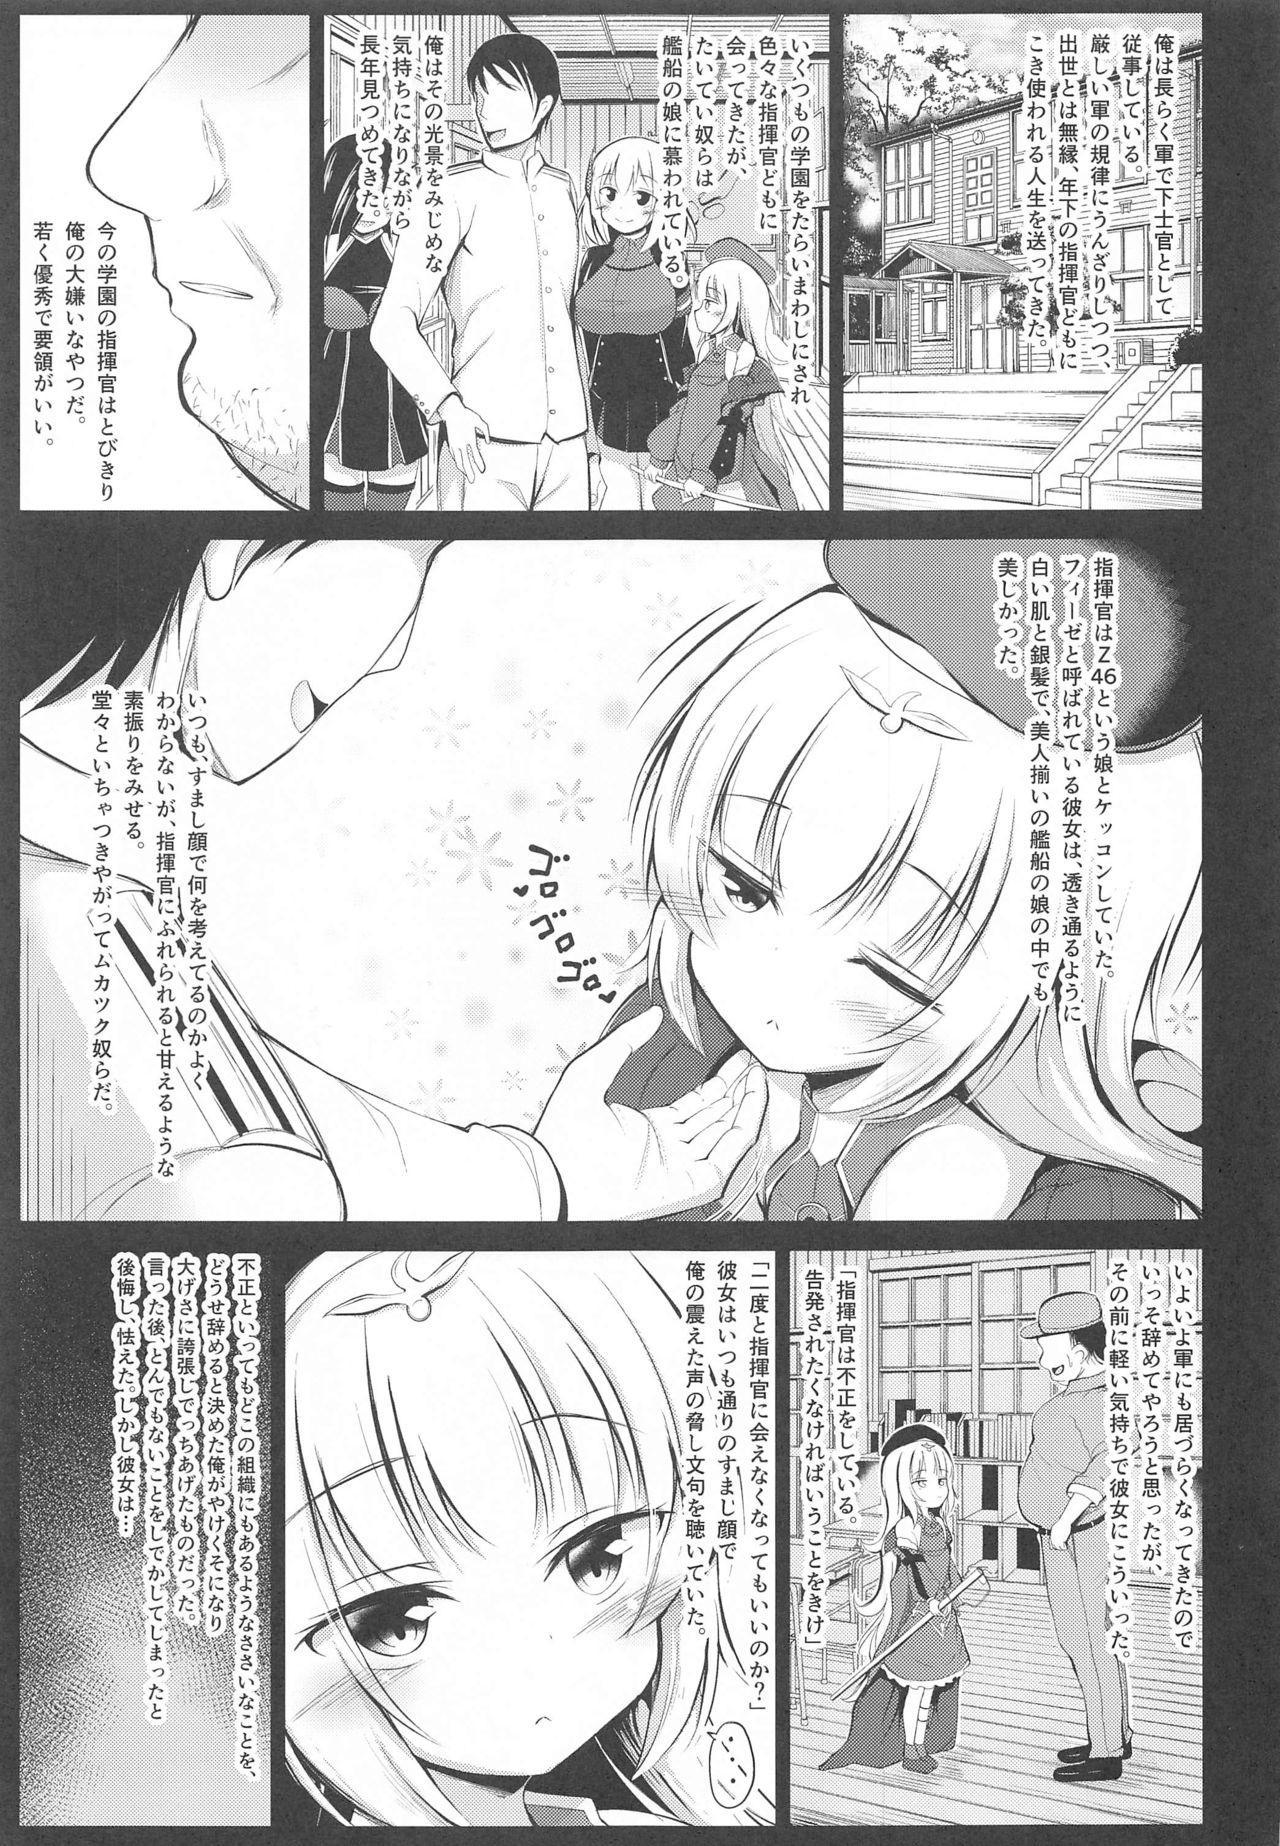 otosaretaZ46chan 3